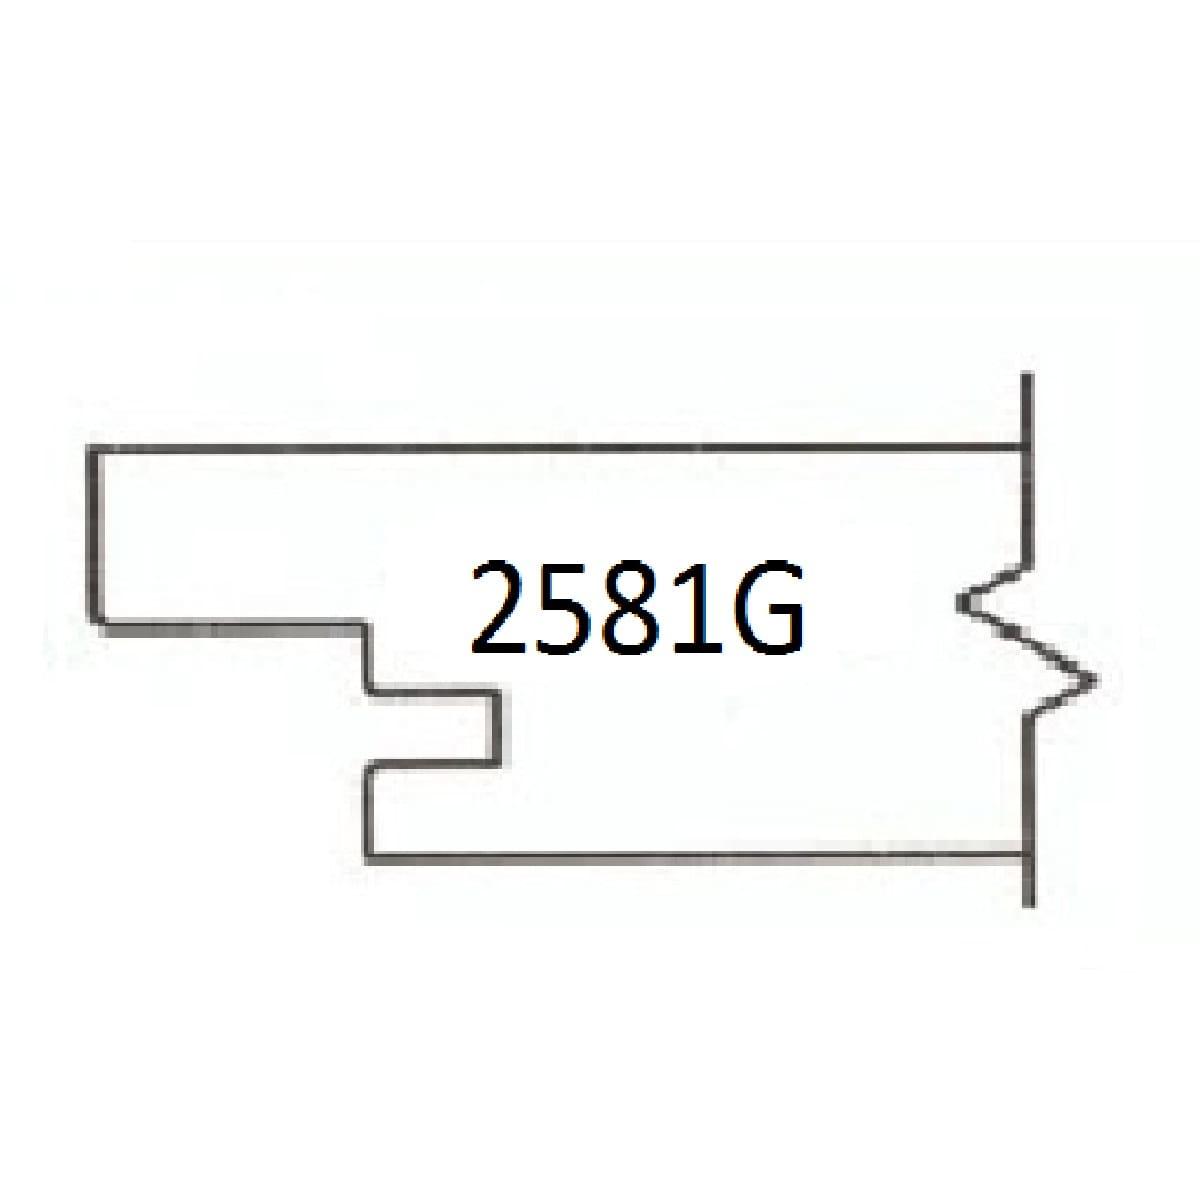 FB-2581G Image